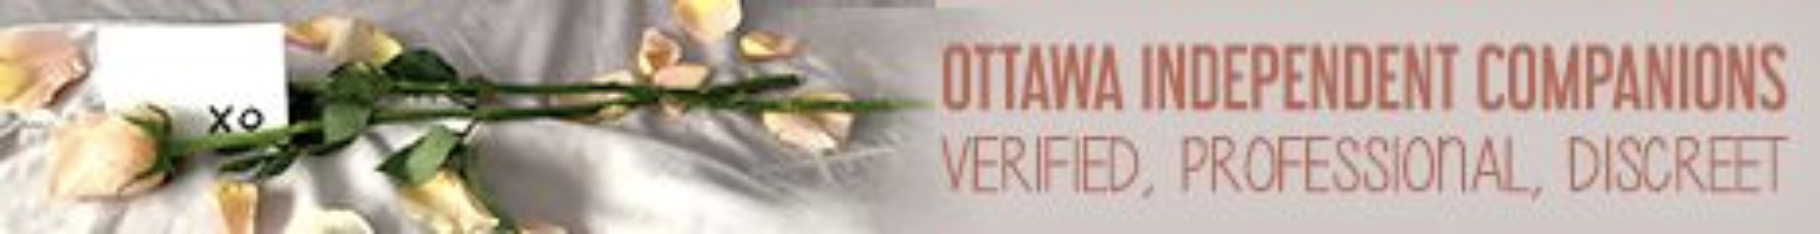 Ottawa Independent Companions